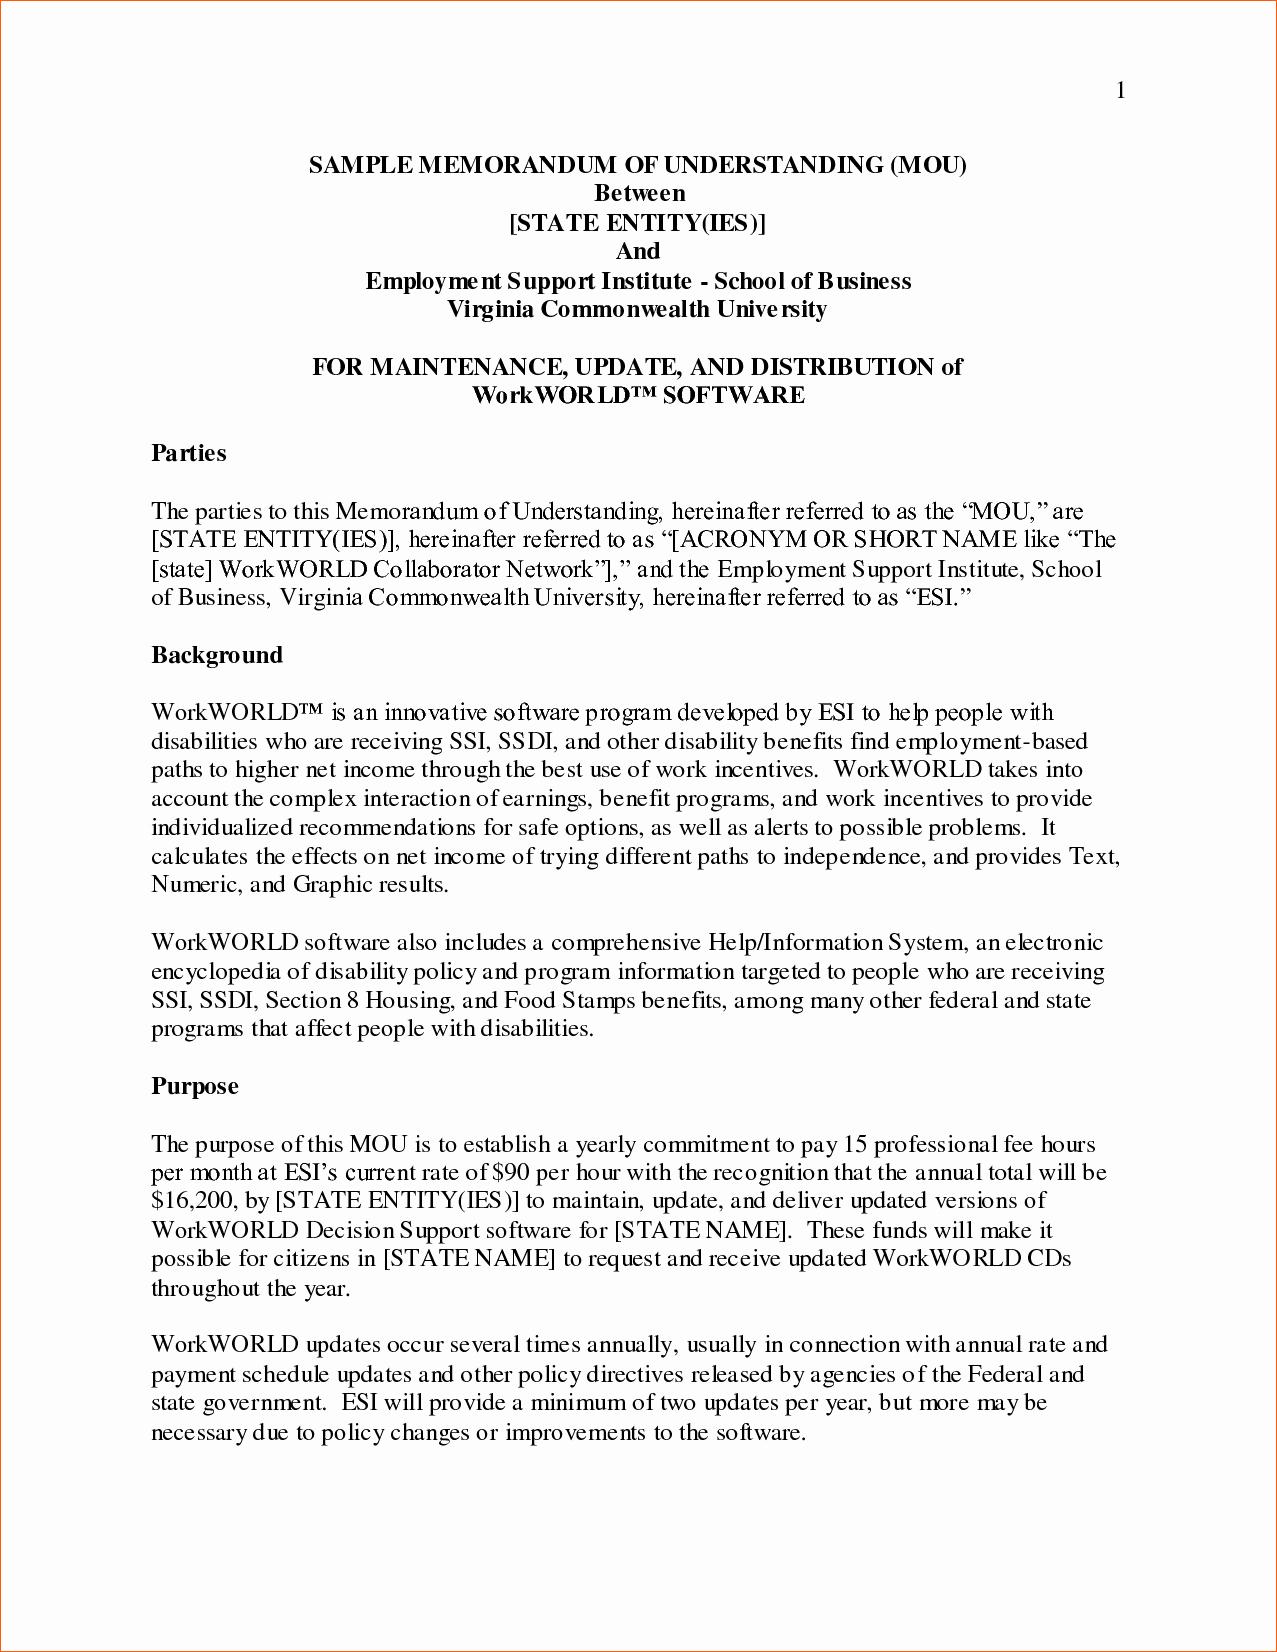 9 Examples Of Memorandum